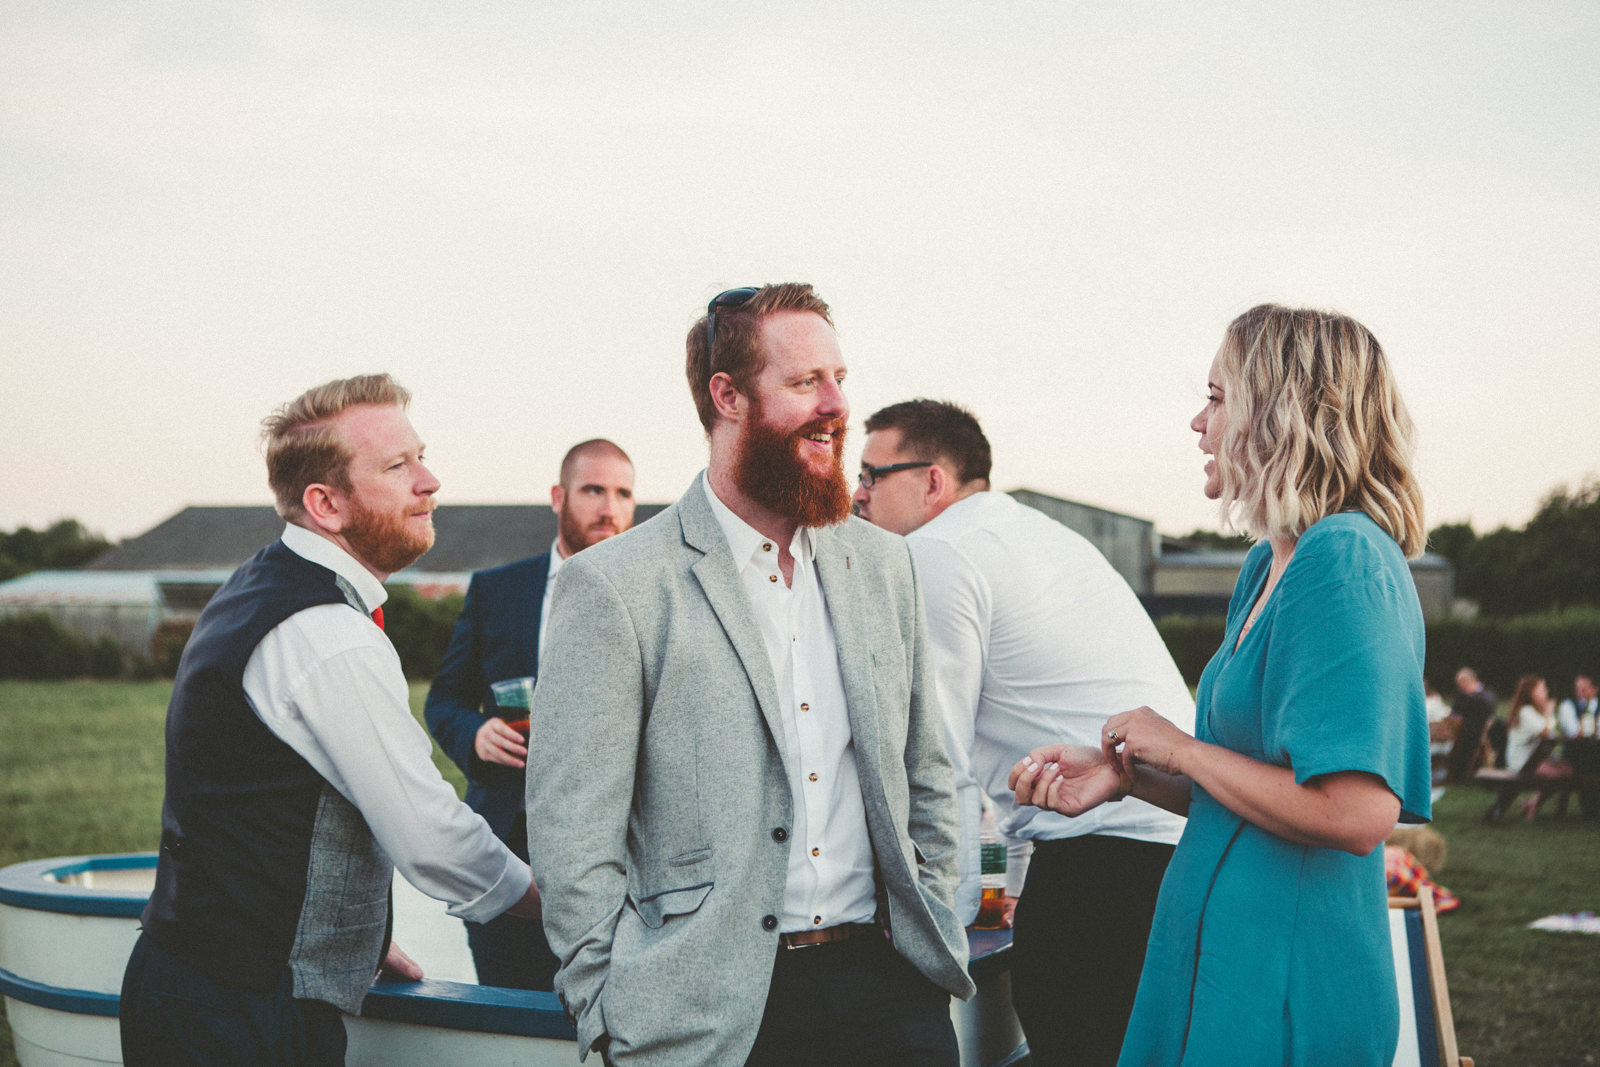 Wedding Photography at Splottsmoor Farm